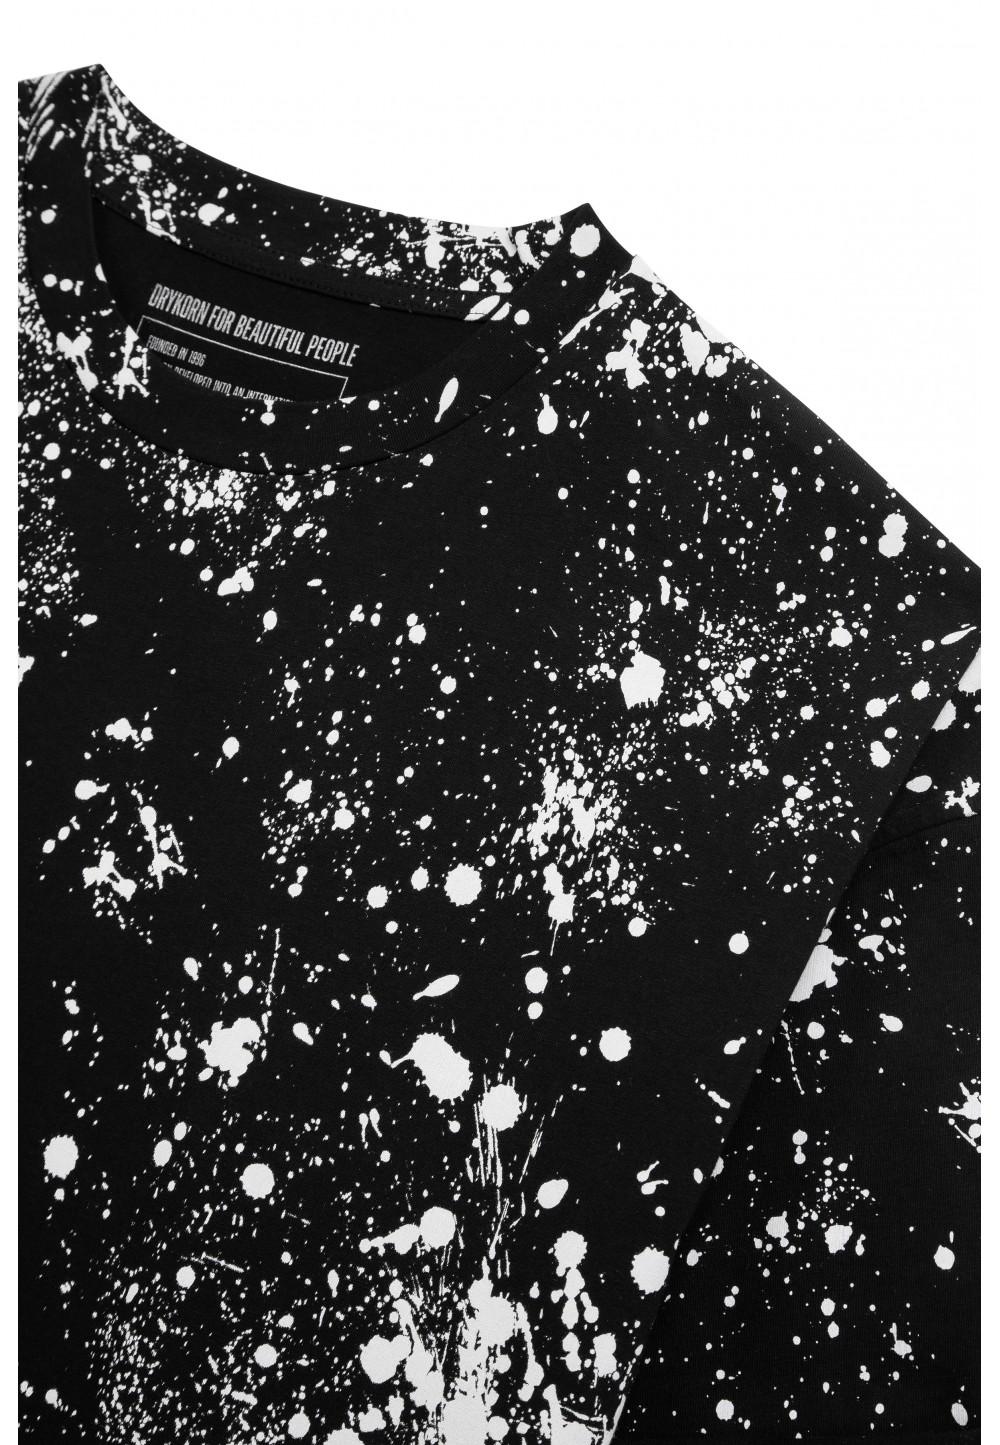 Чоловіча футболка THILO з бризками фарби